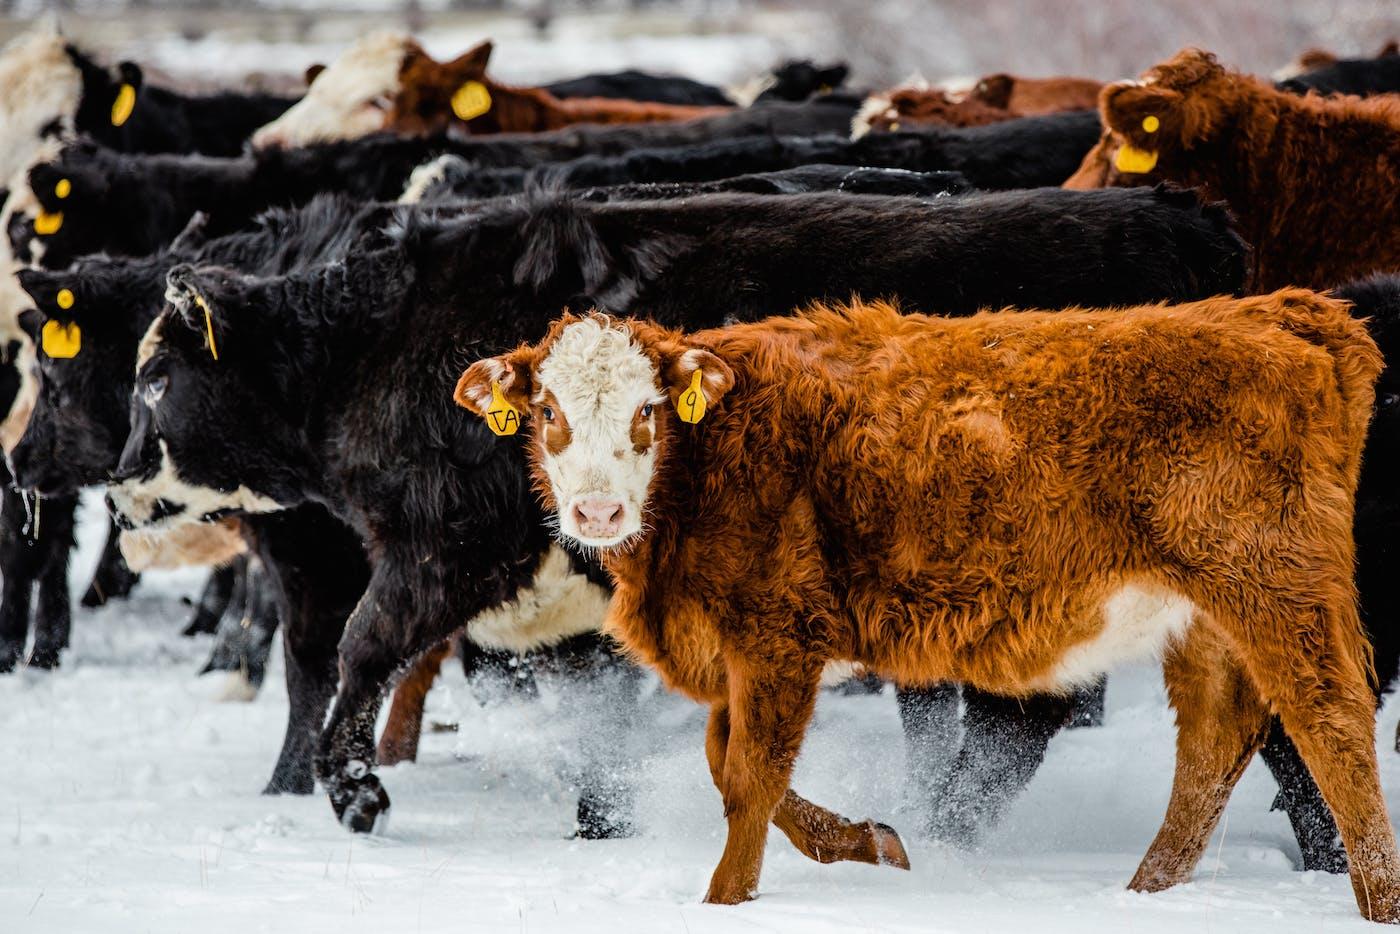 Filson Life - Wyoming Cowboy